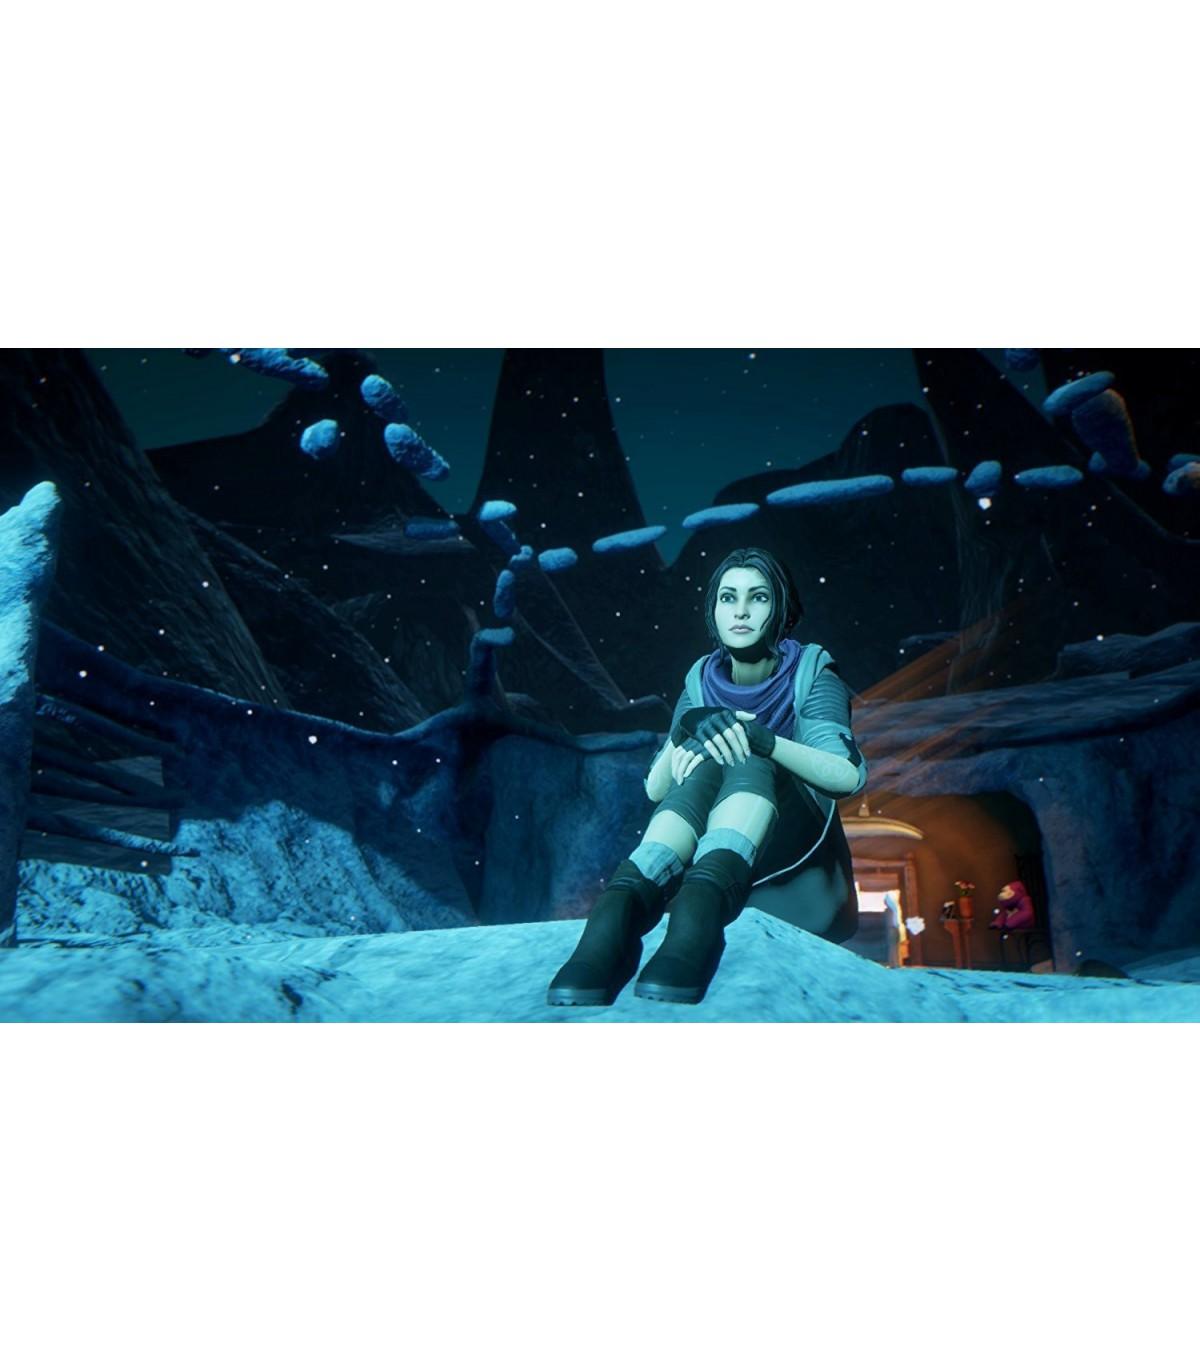 بازی Dreamfall Chapters - پلی استیشن 4